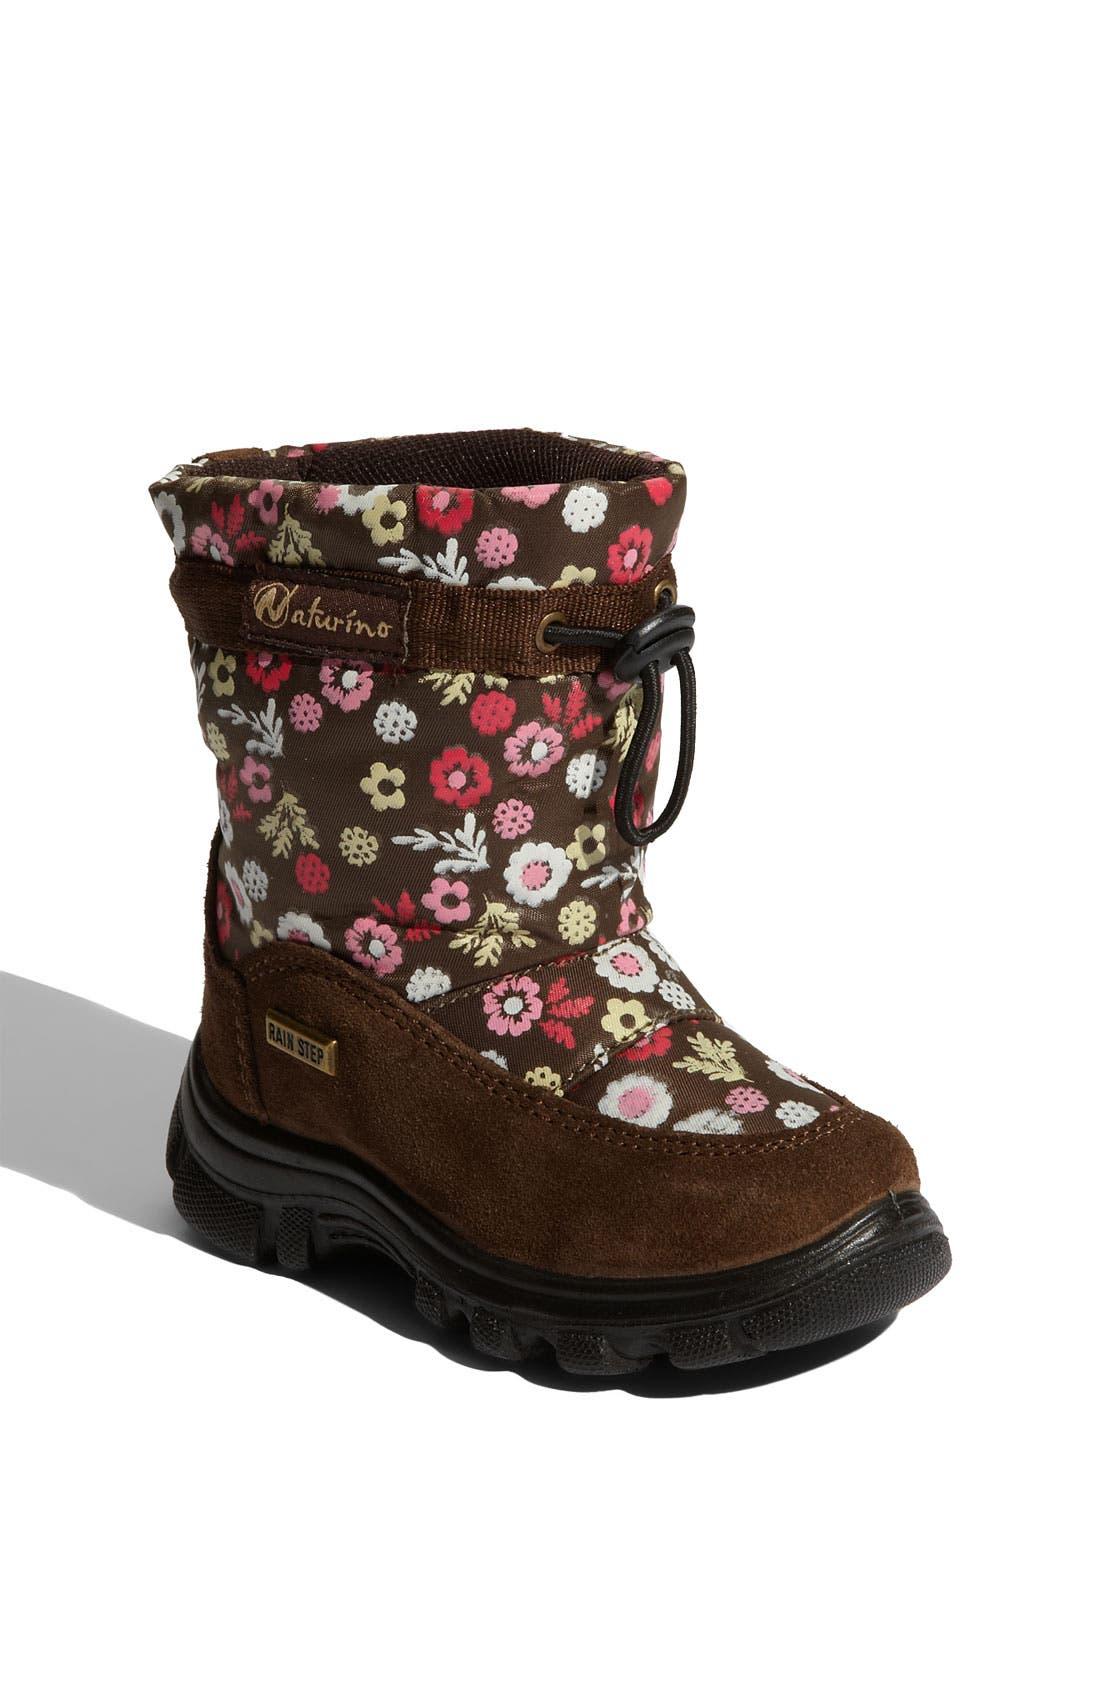 Alternate Image 1 Selected - Naturino 'Varna' Boot (Walker & Toddler)